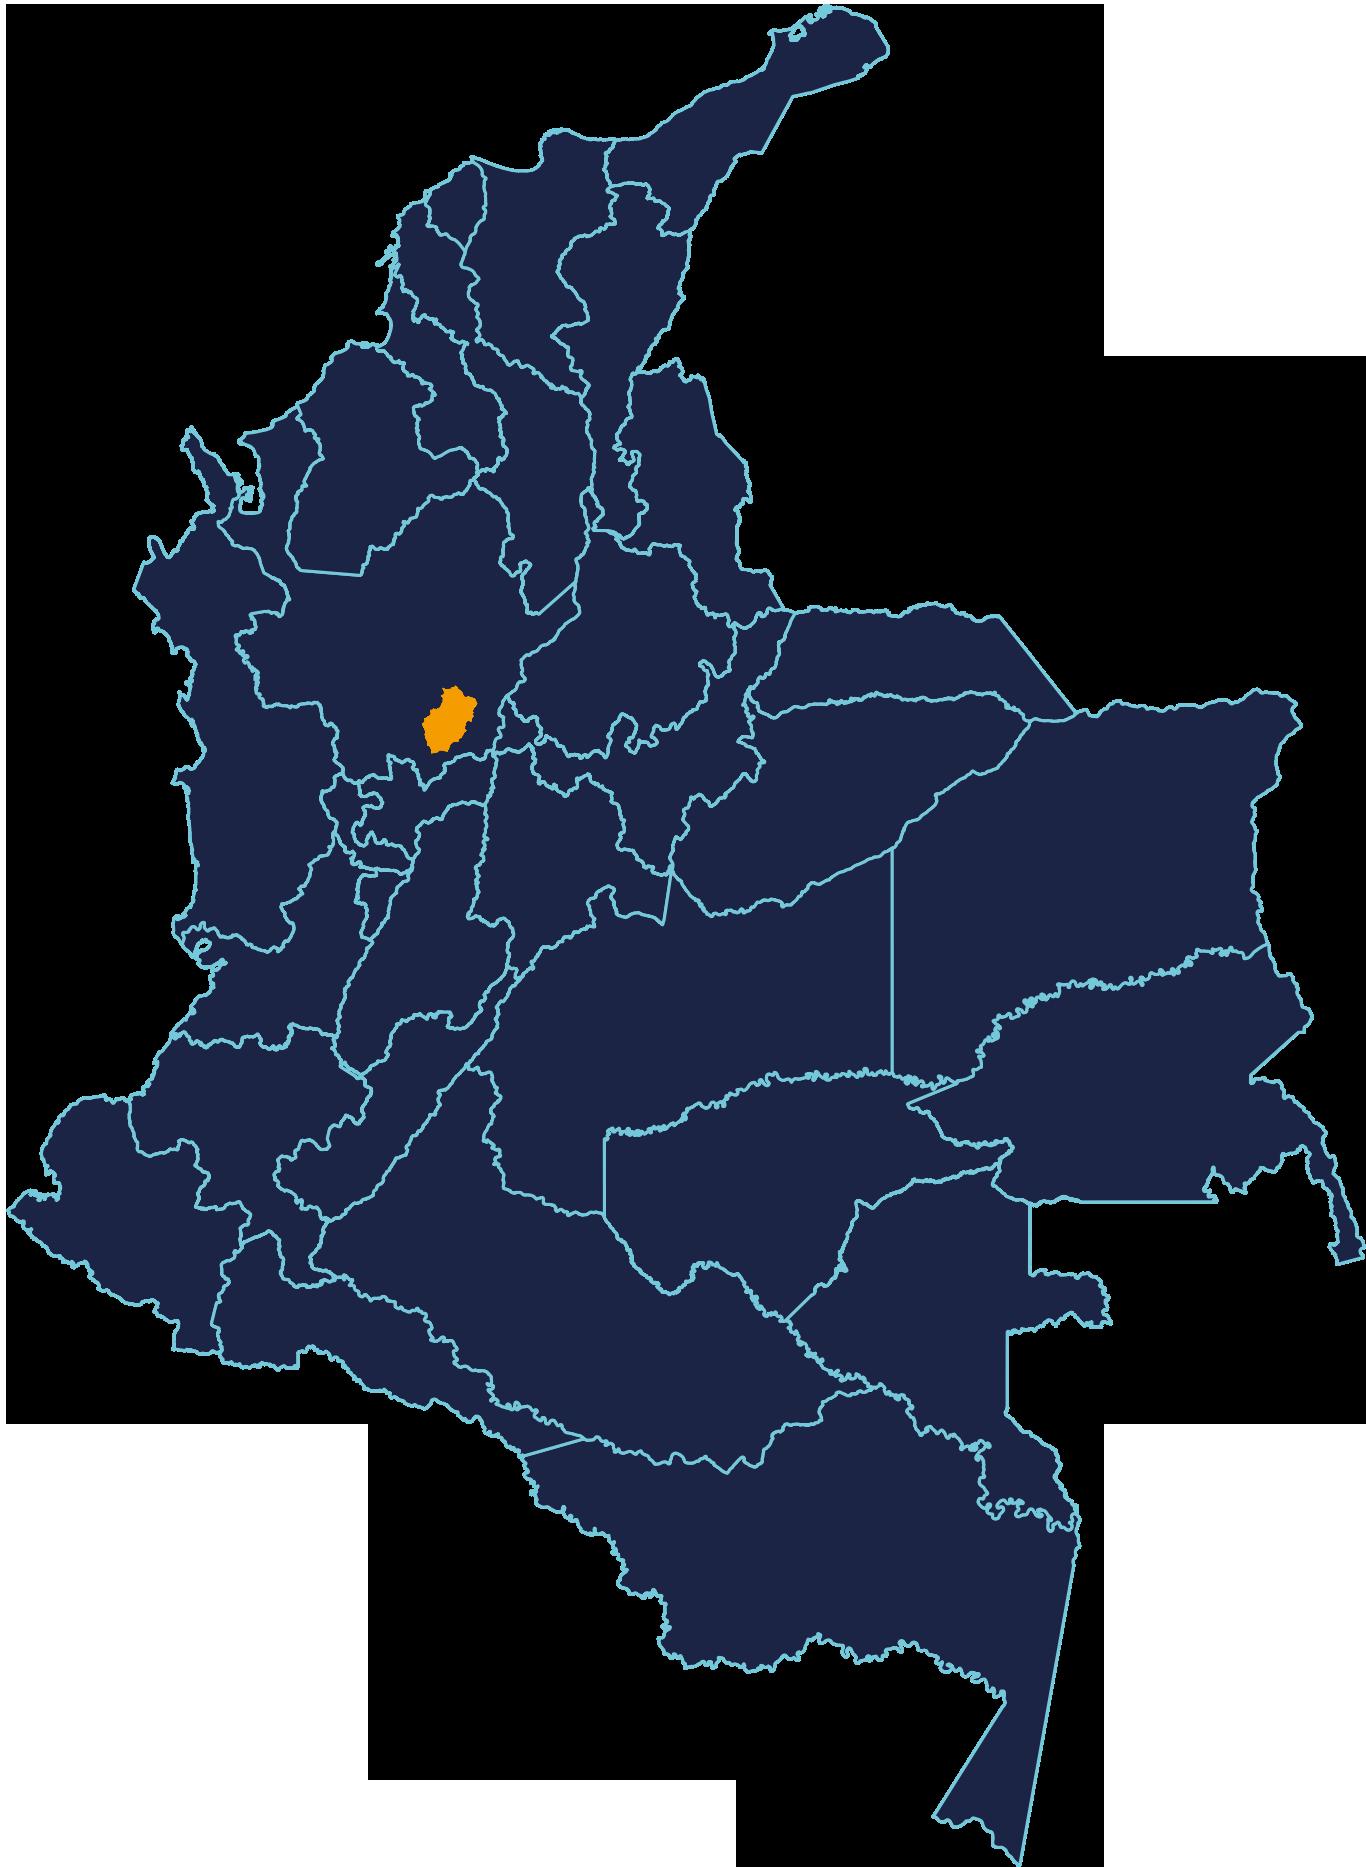 Mapa de referencia